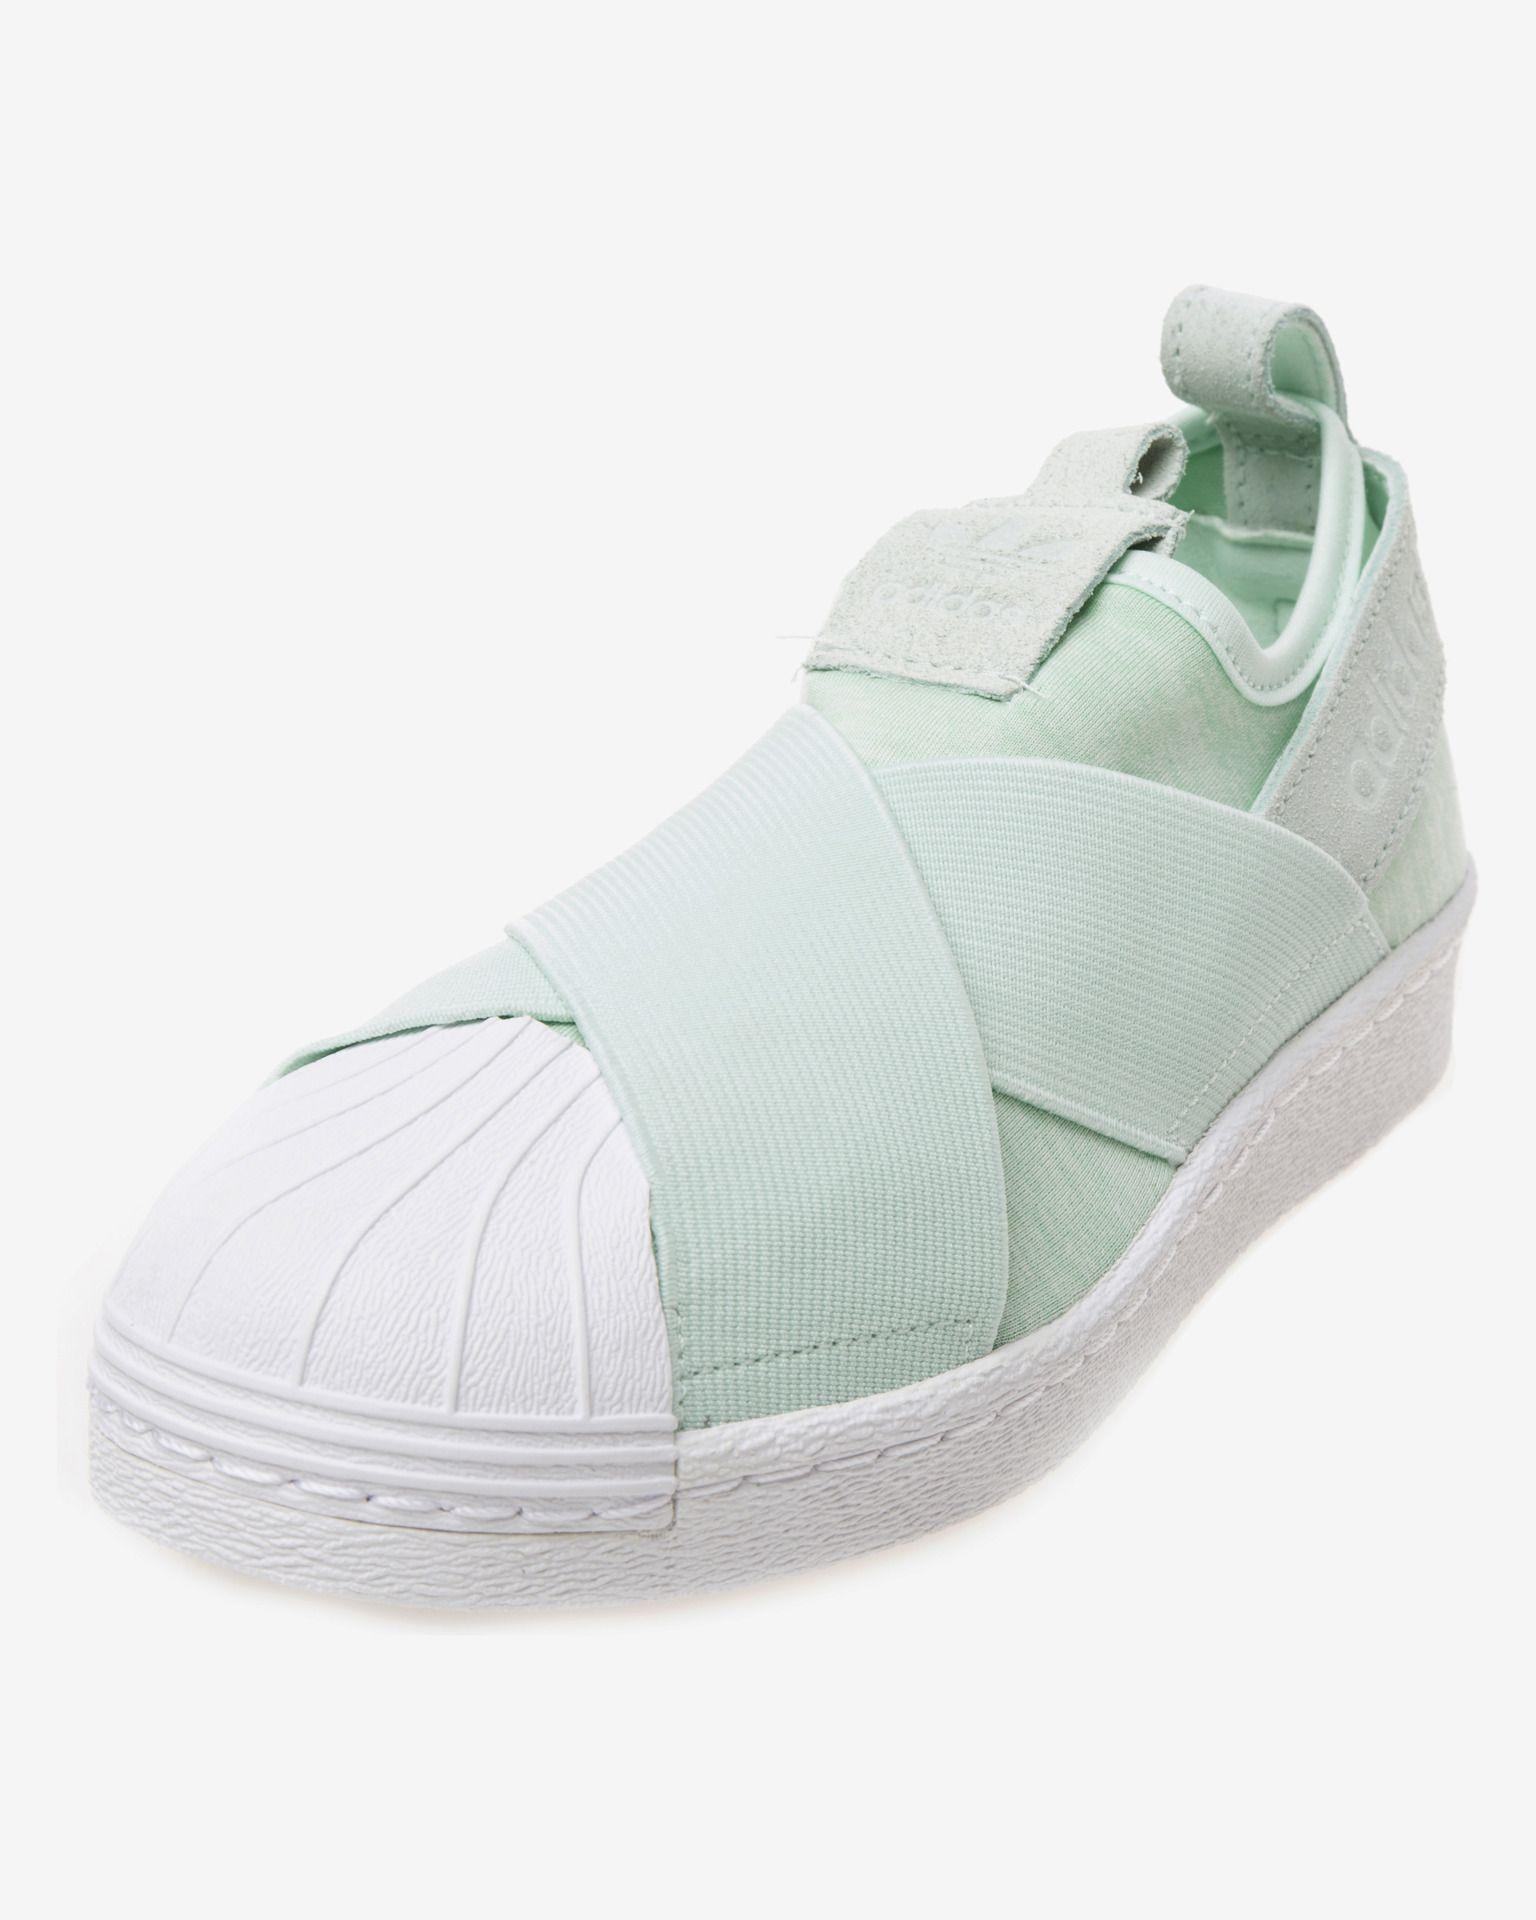 adidas yeezy boost 350 women 6 adidas superstar slip on w